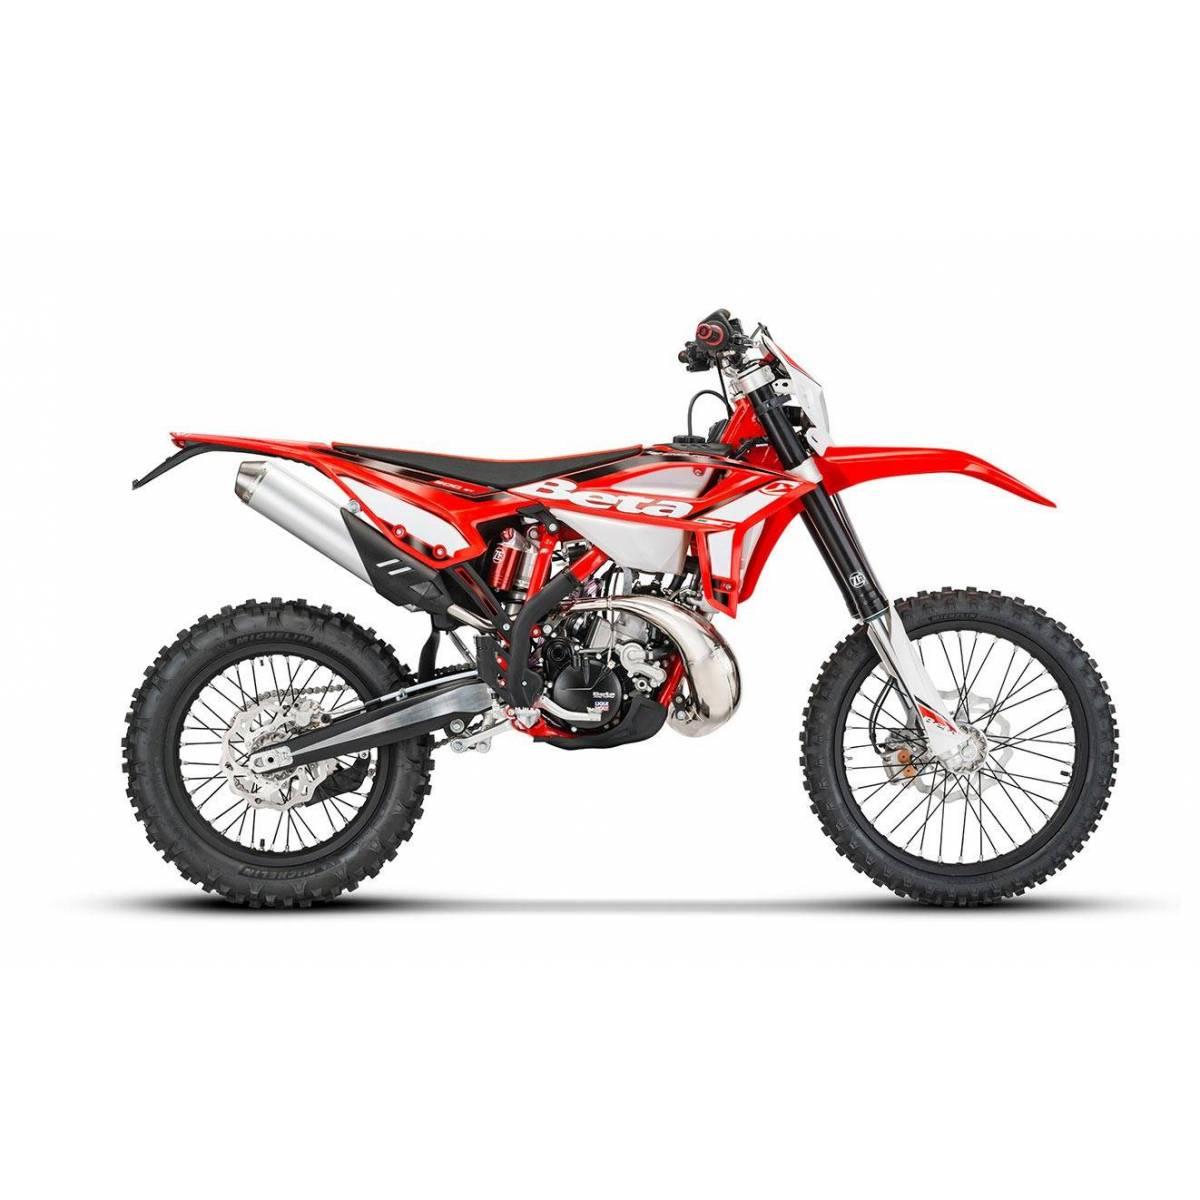 BETA ENDURO RR 200 2T 2021